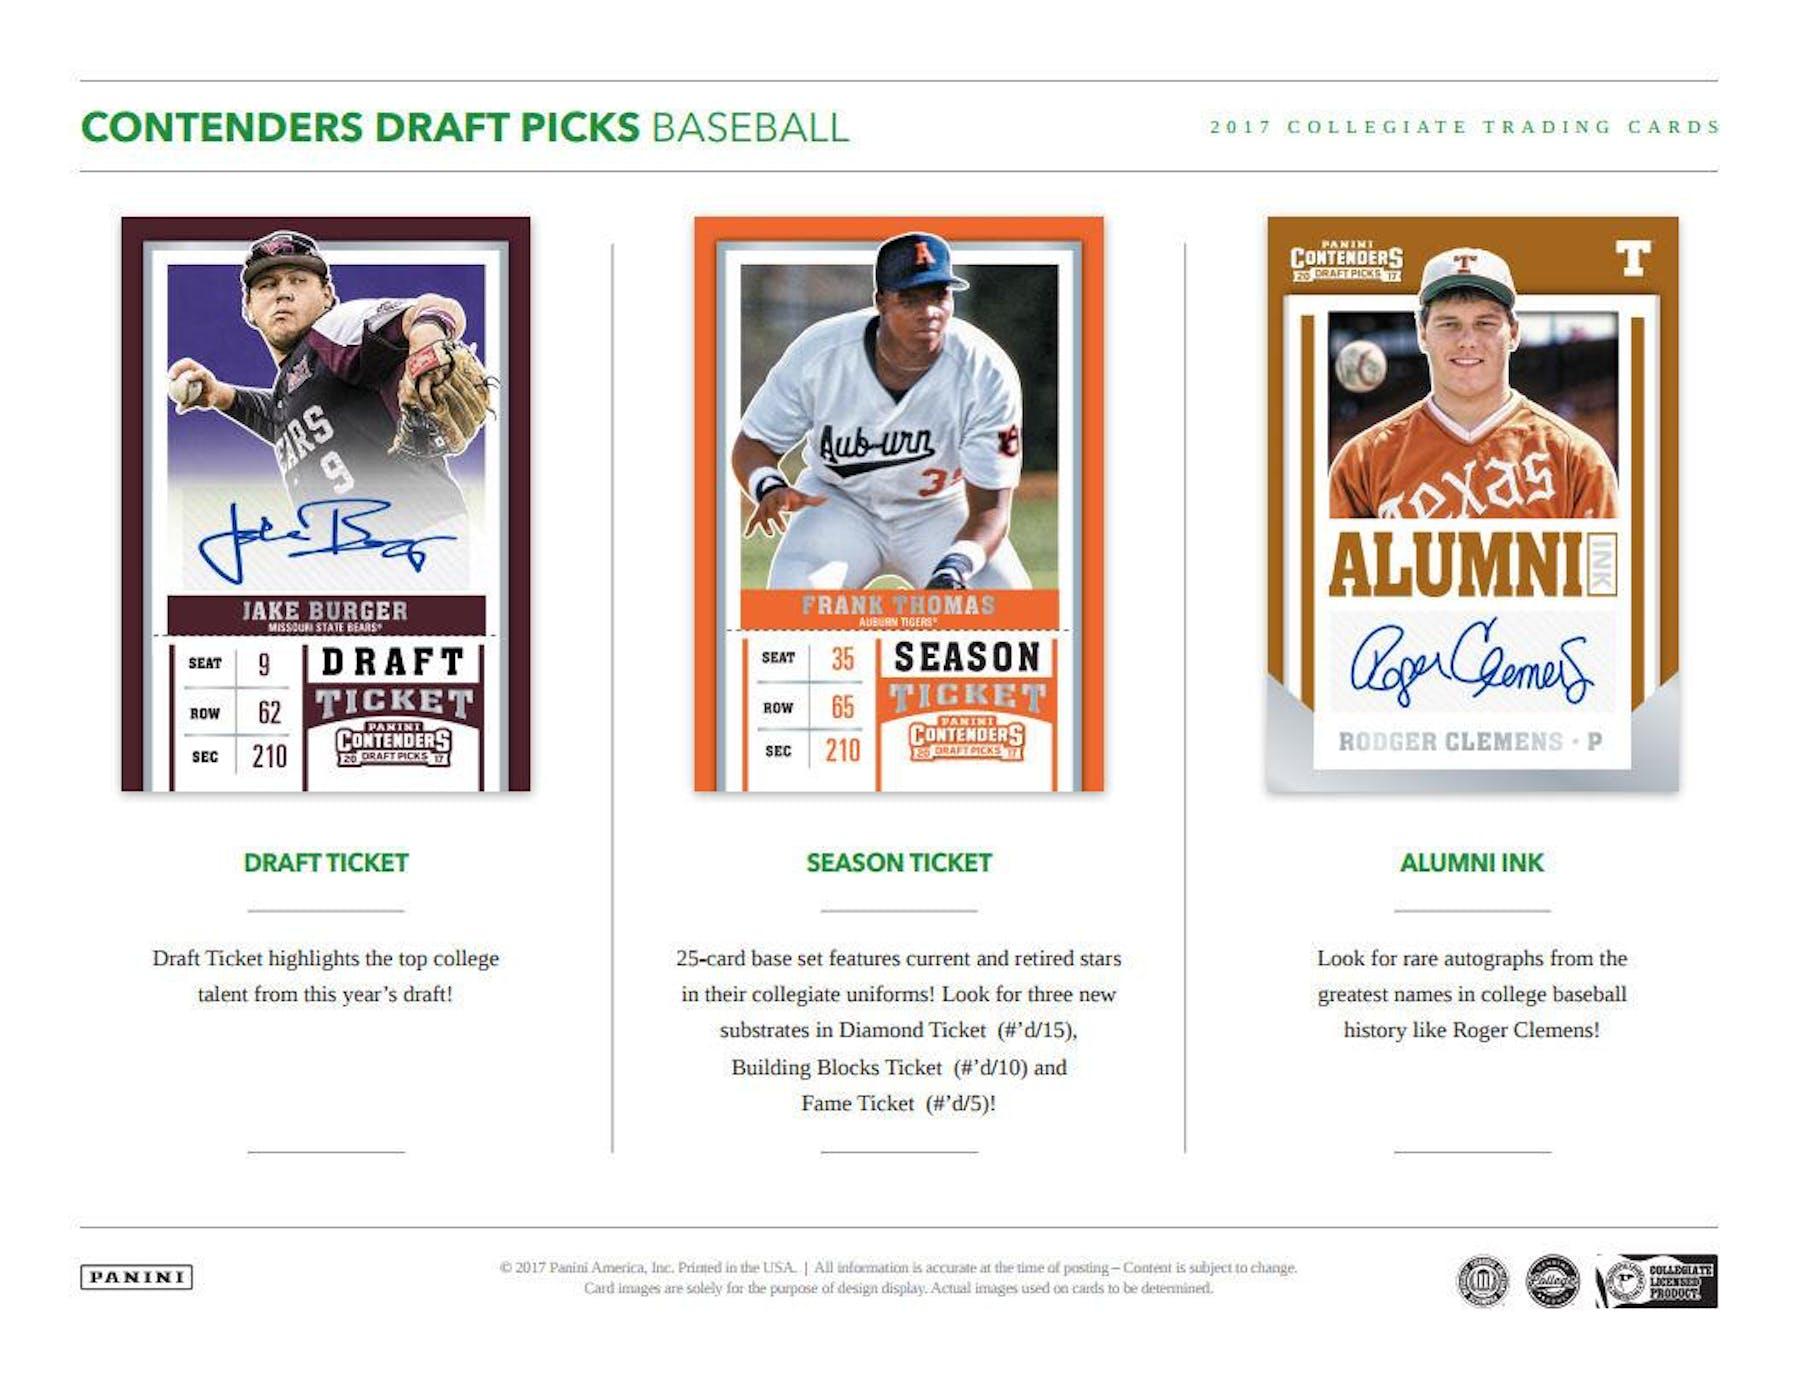 2017 Panini Contenders Draft Picks Baseball Hobby Box | DA Card